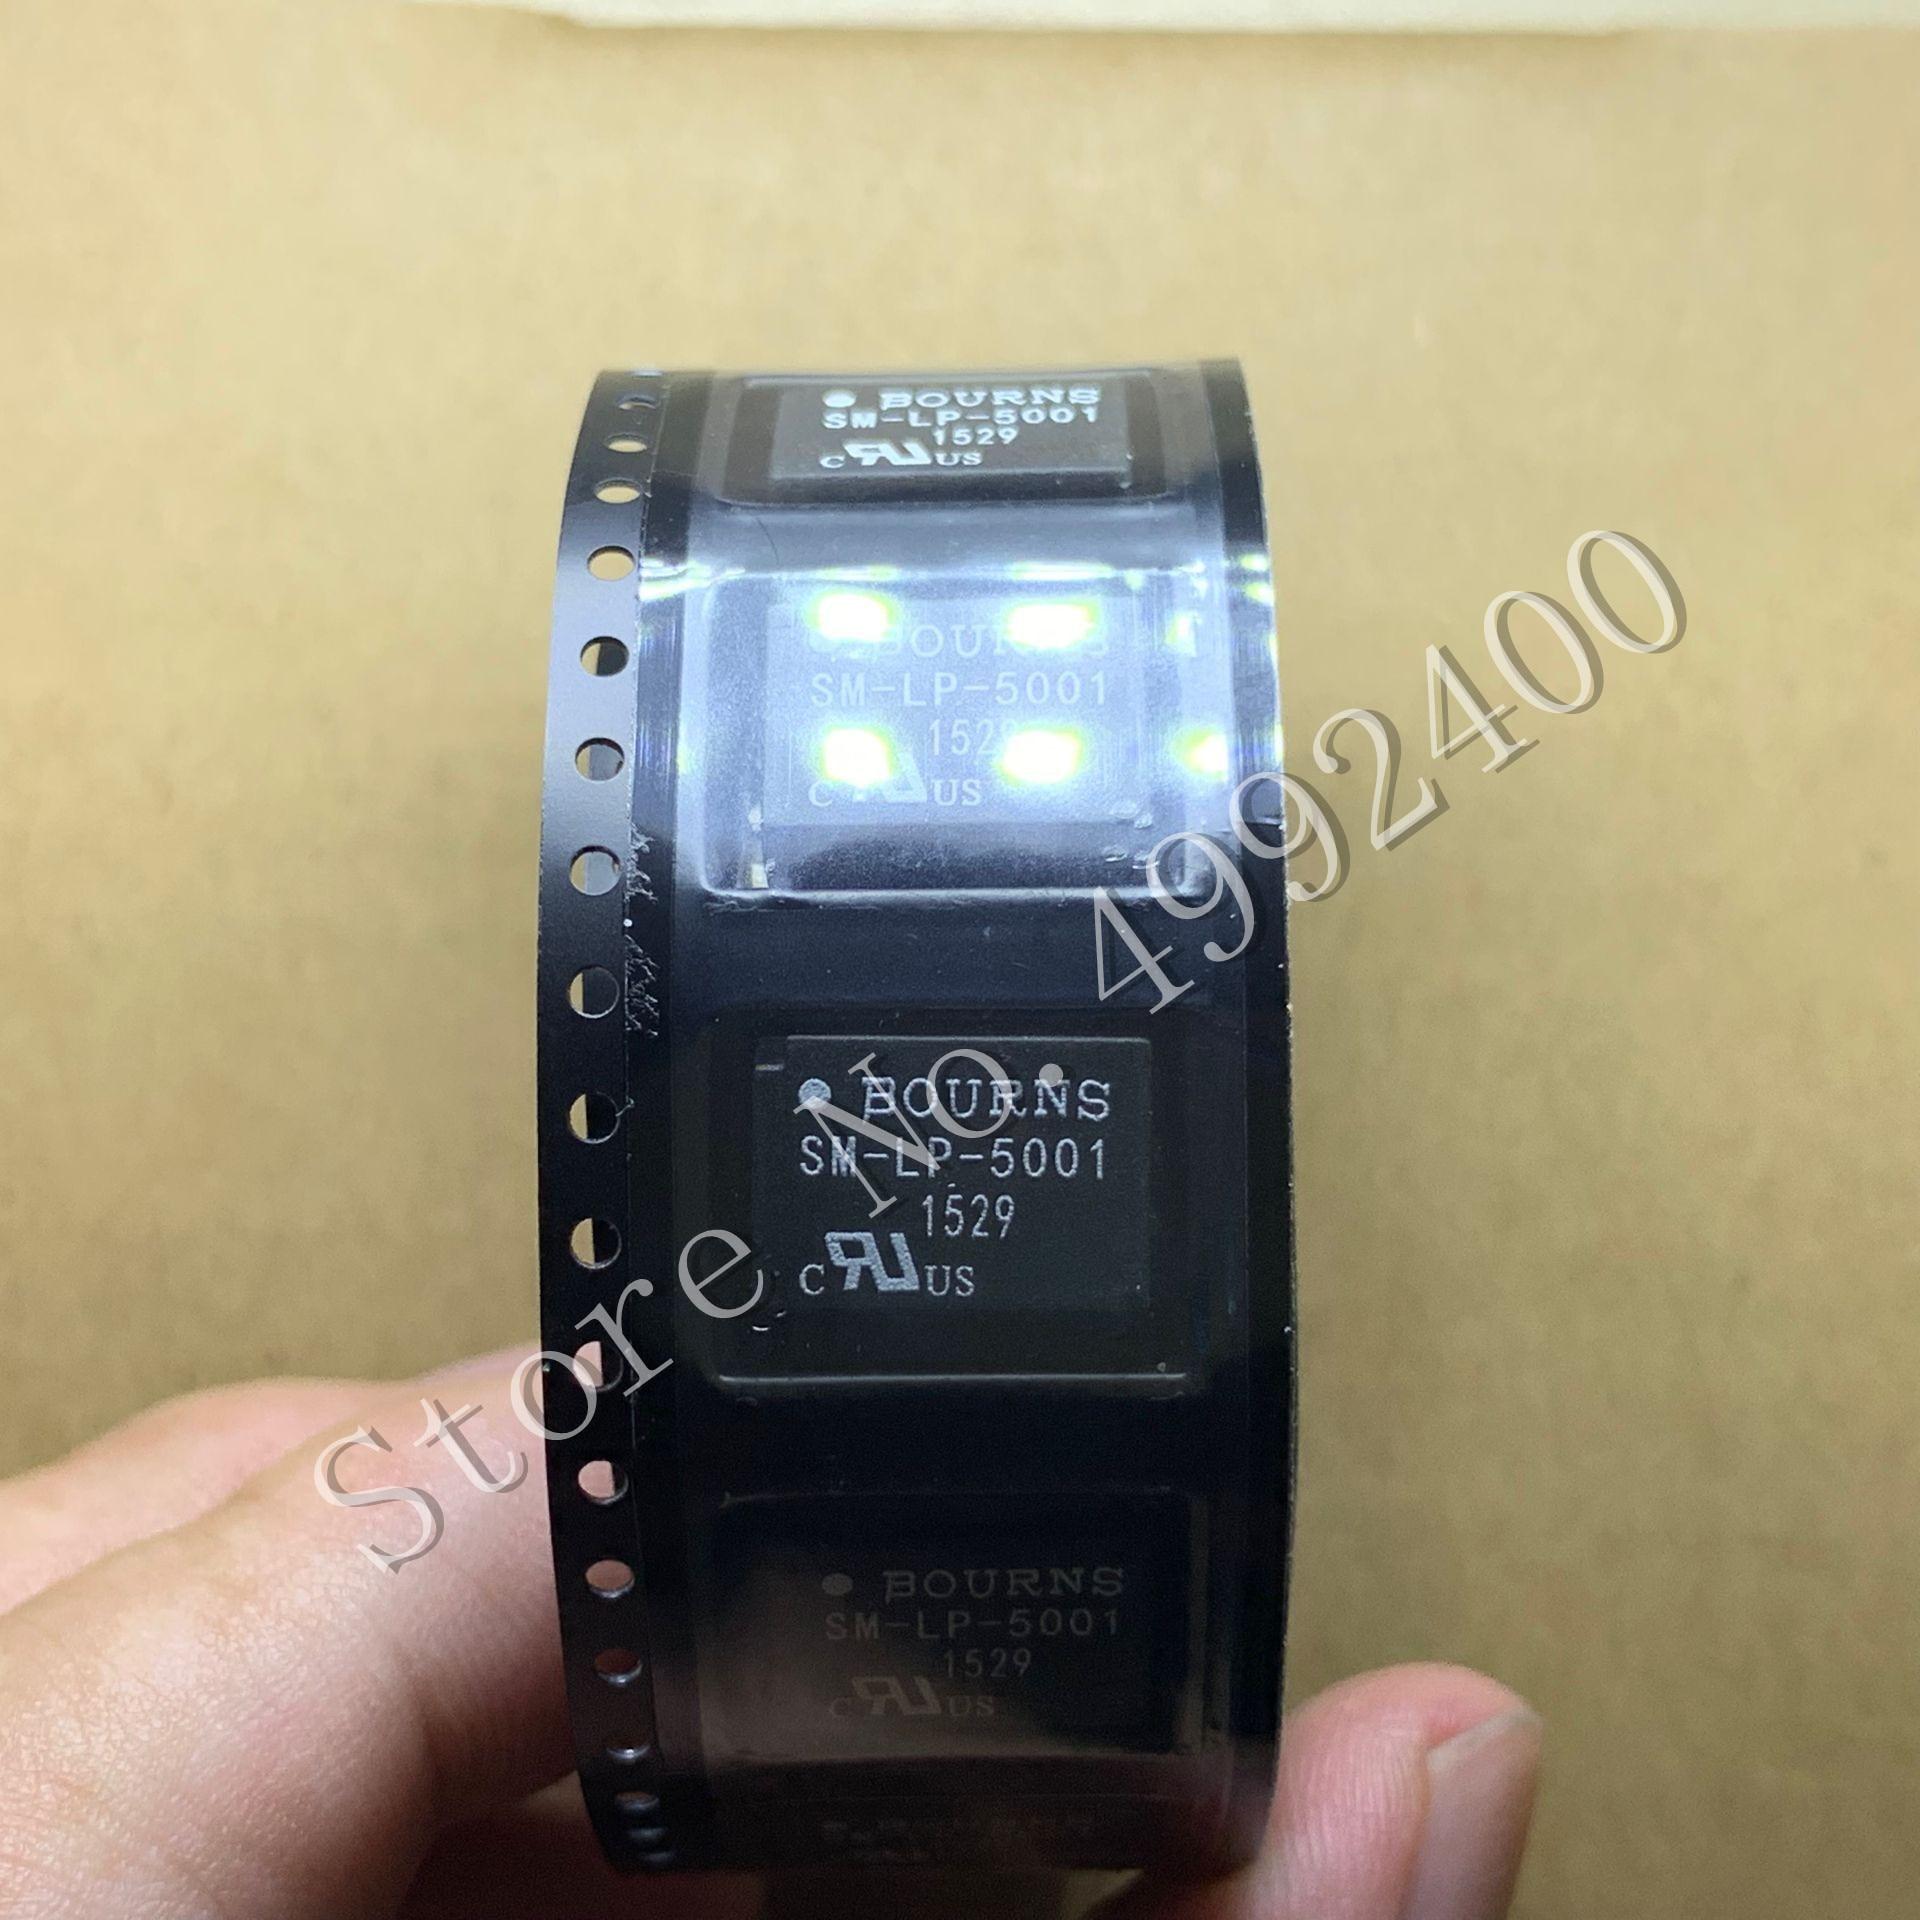 20 pçs/lote SM-LP-5001